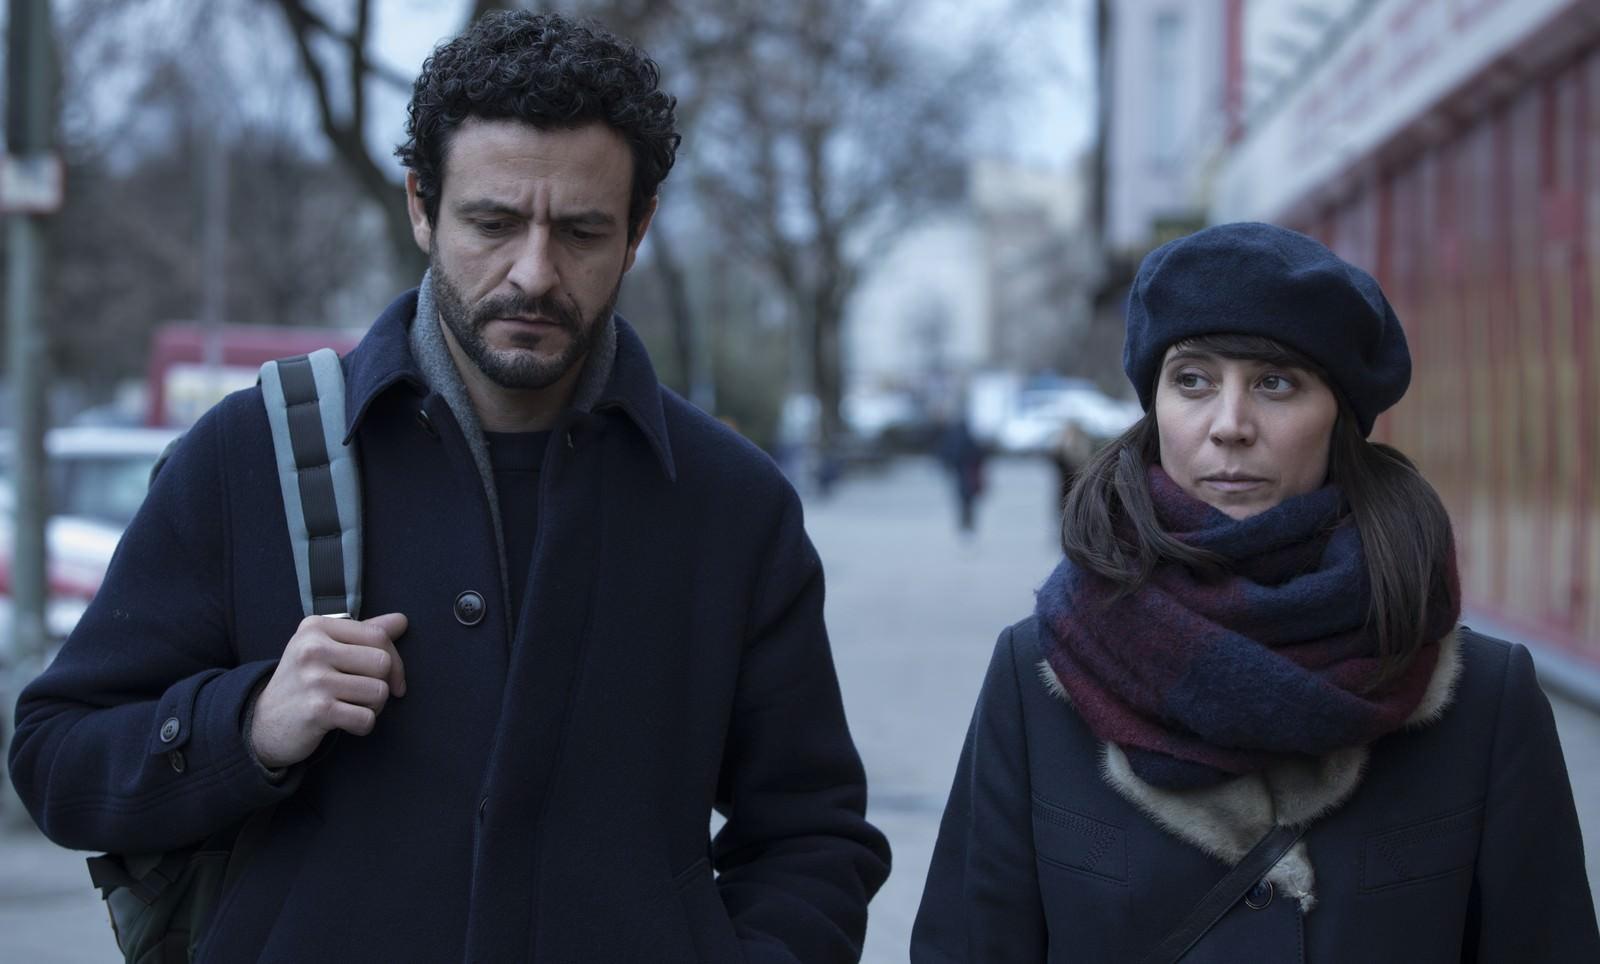 Movie, Las Distancias(西班牙, 2018年) / 異鄉真心話(台灣) / 最熟悉的陌生人(網路), 電影角色與演員介紹